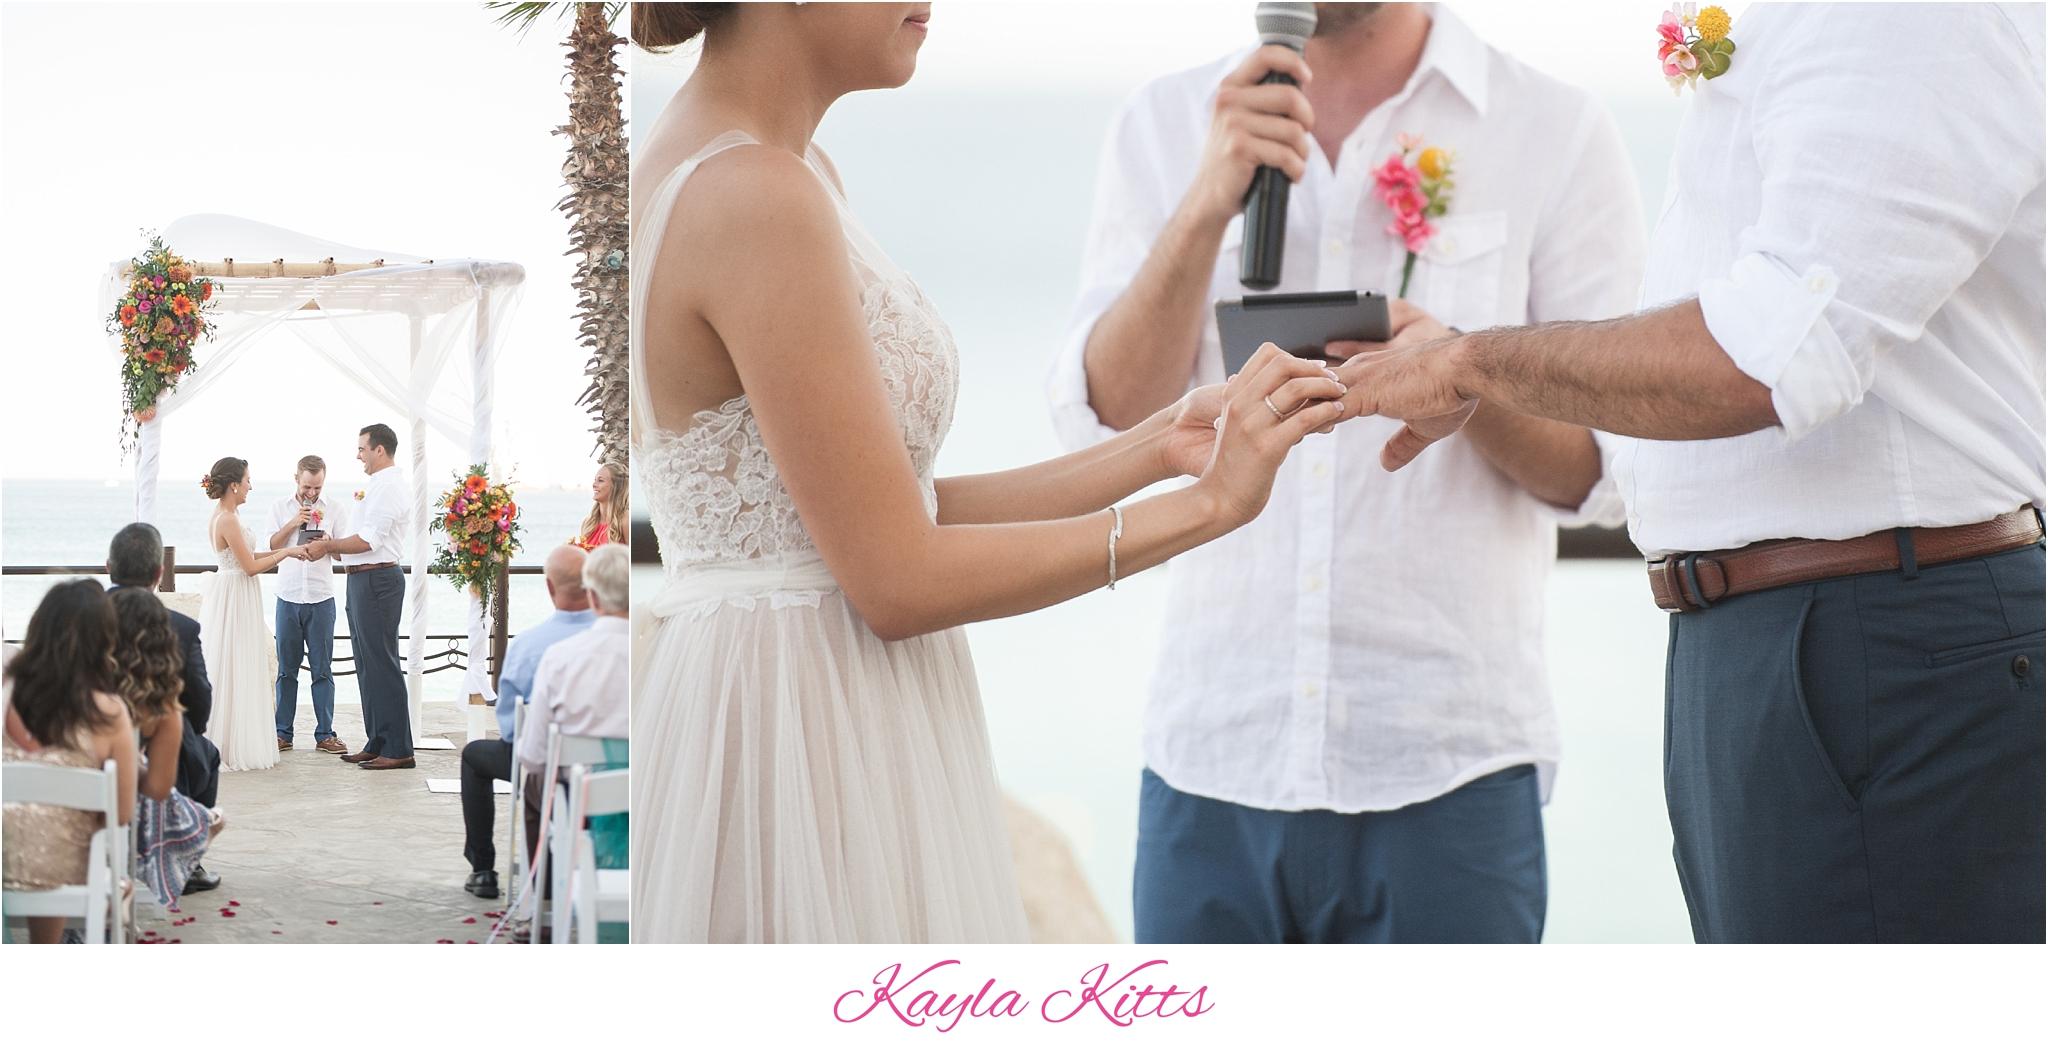 kayla kitts photography-travis and sarah-cabo wedding-cabo wedding photographer-destination wedding photographer-paris wedding photographer-albuquerque wedding-matt jones-albuquerque wedding vendor-intimate wedding_0017.jpg